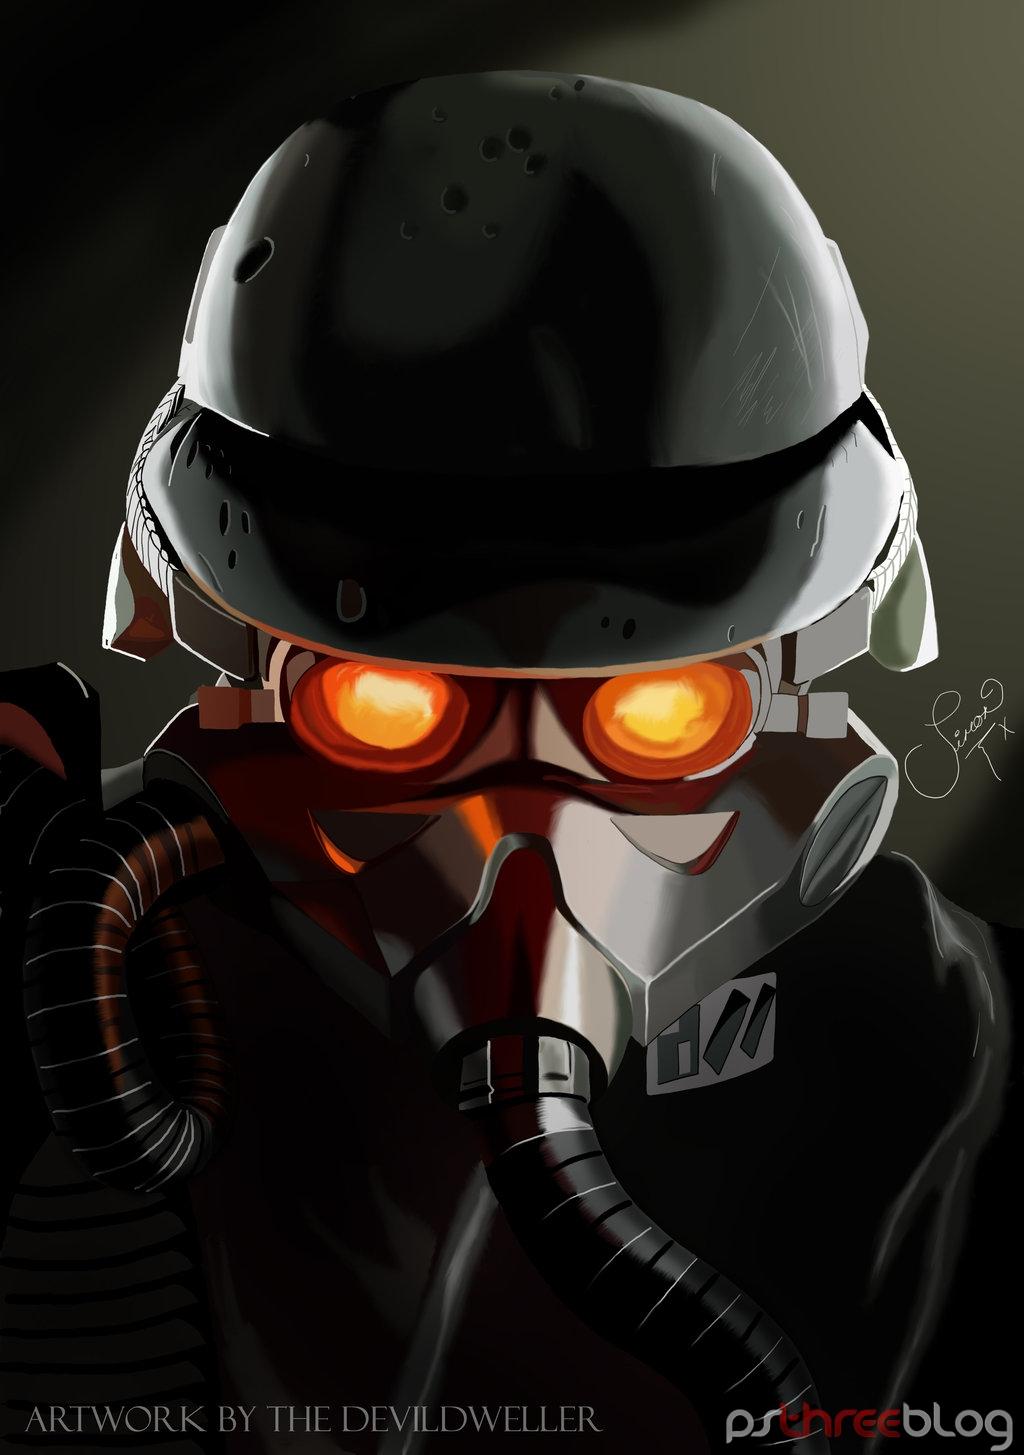 Killzone by thedevildweller-1-.jpg